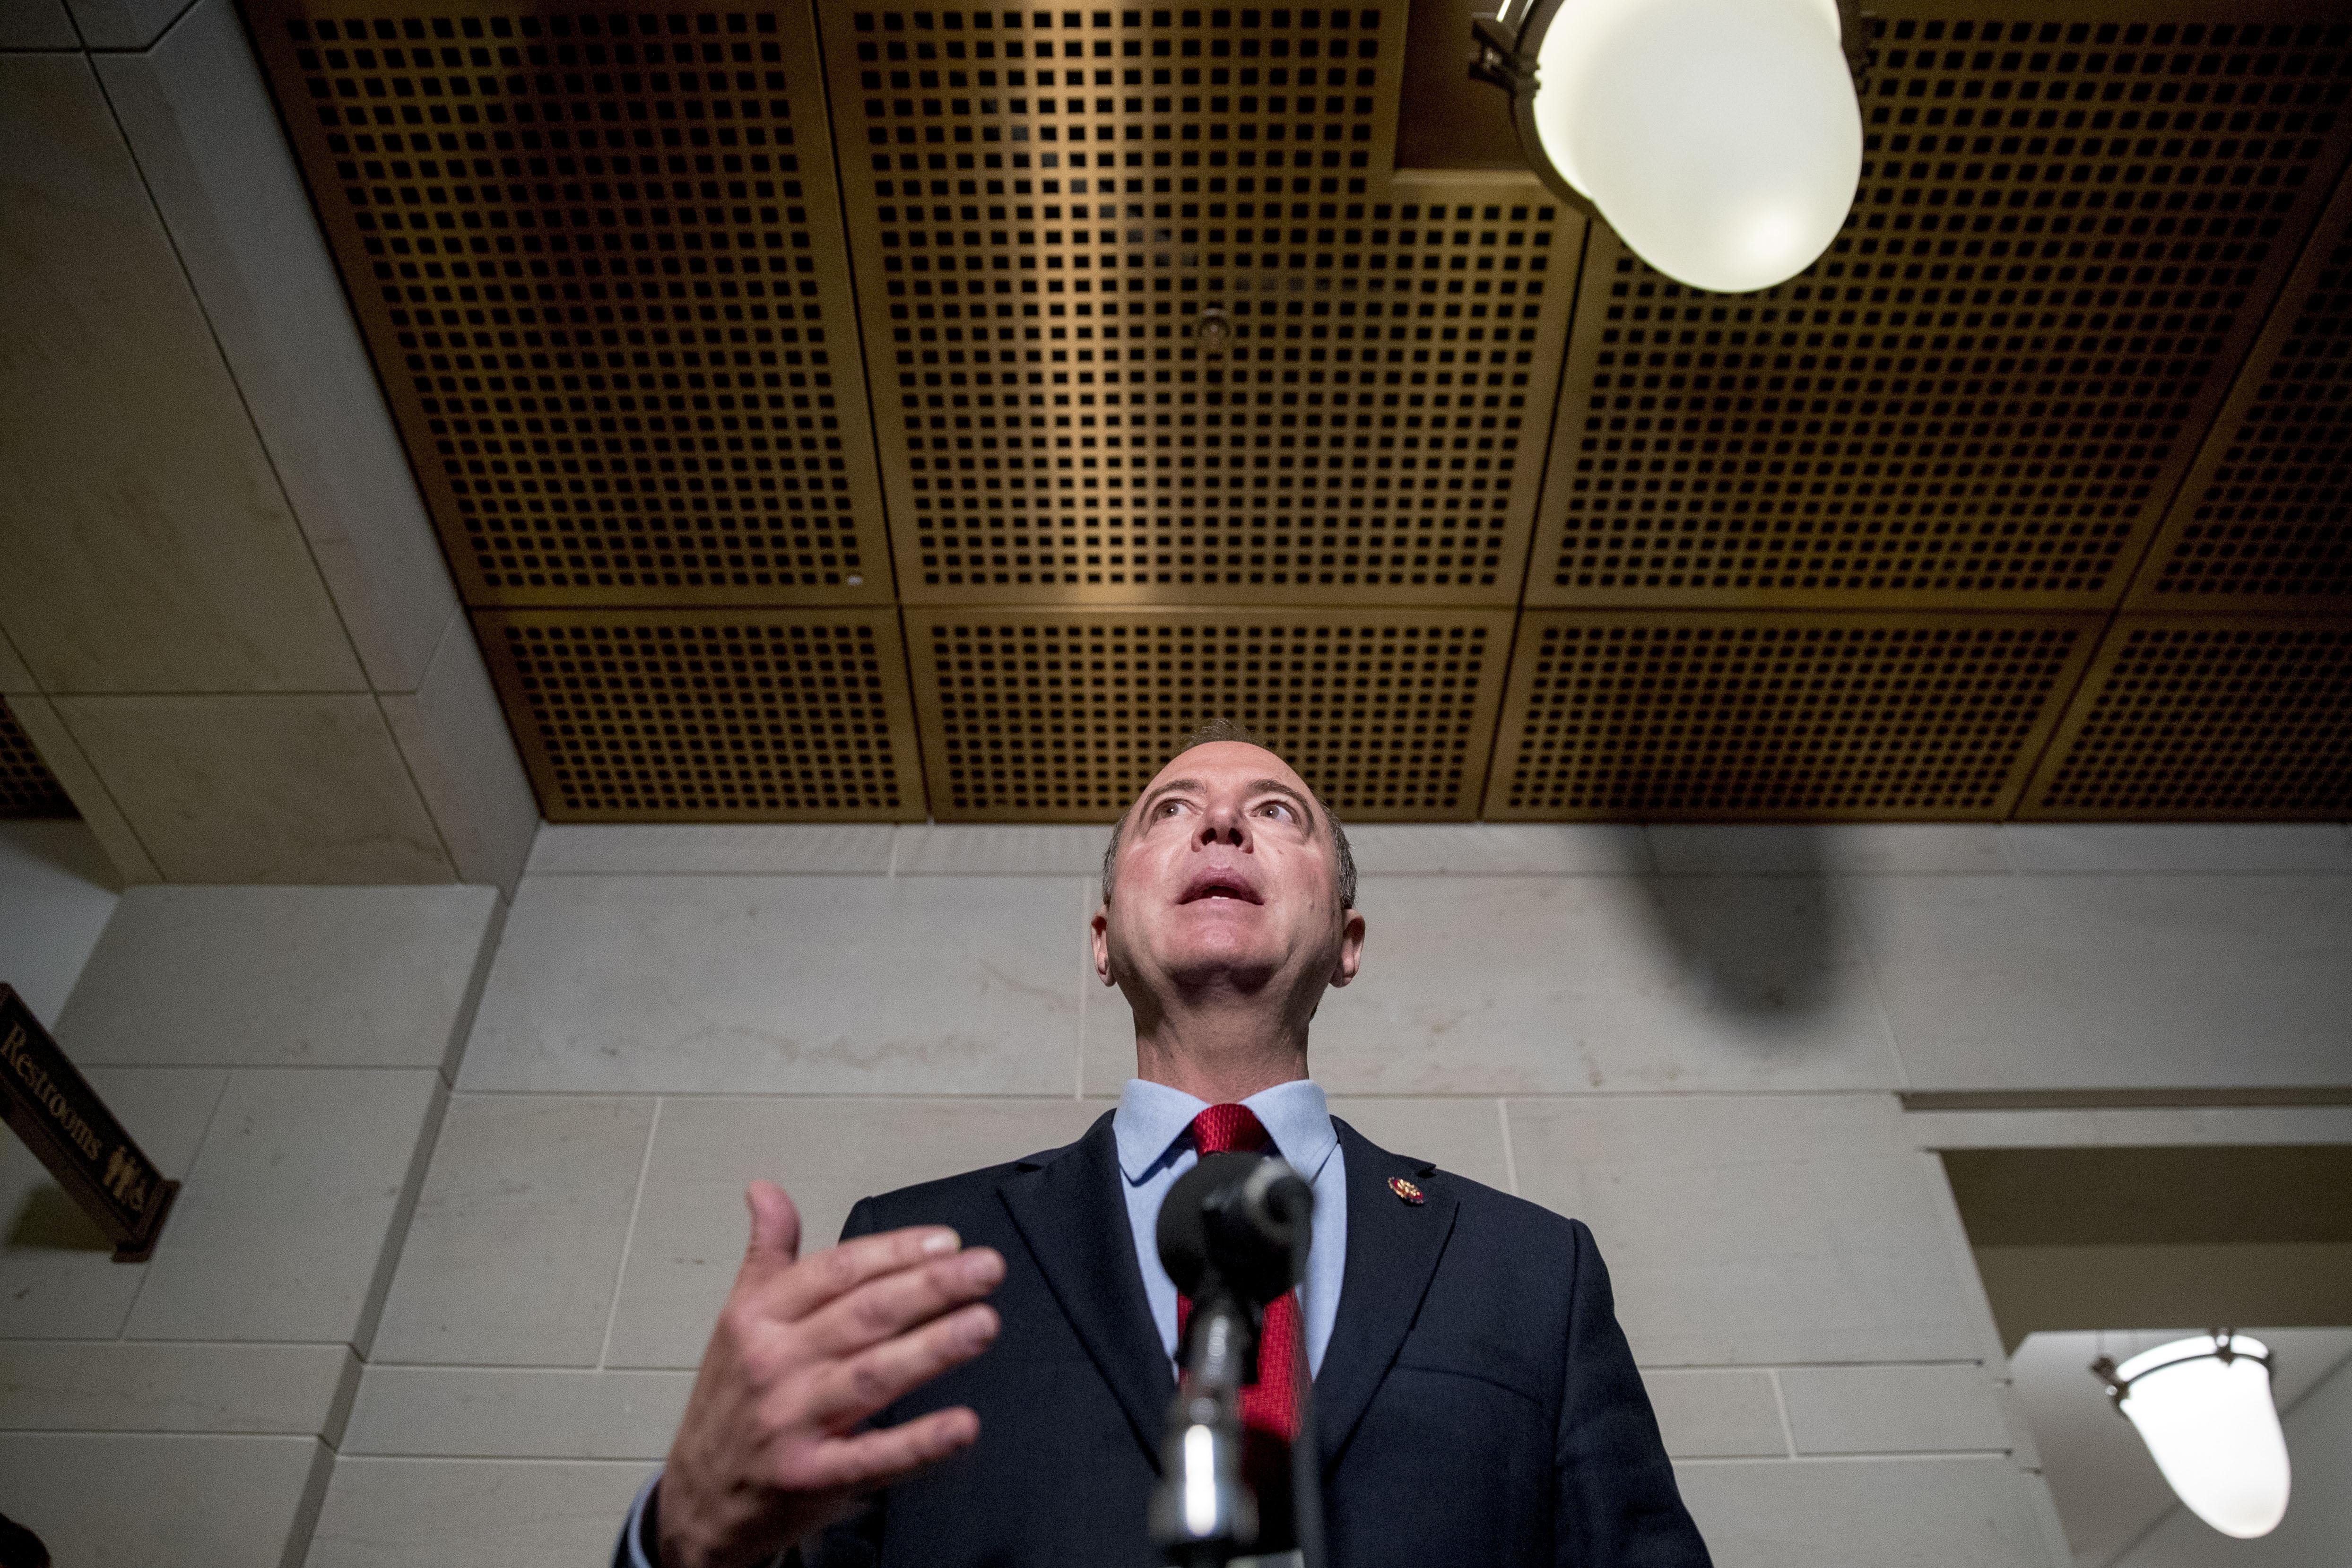 Lies, leaks and half-truths: Adam Schiff's credibility crumbling amid impeachment push